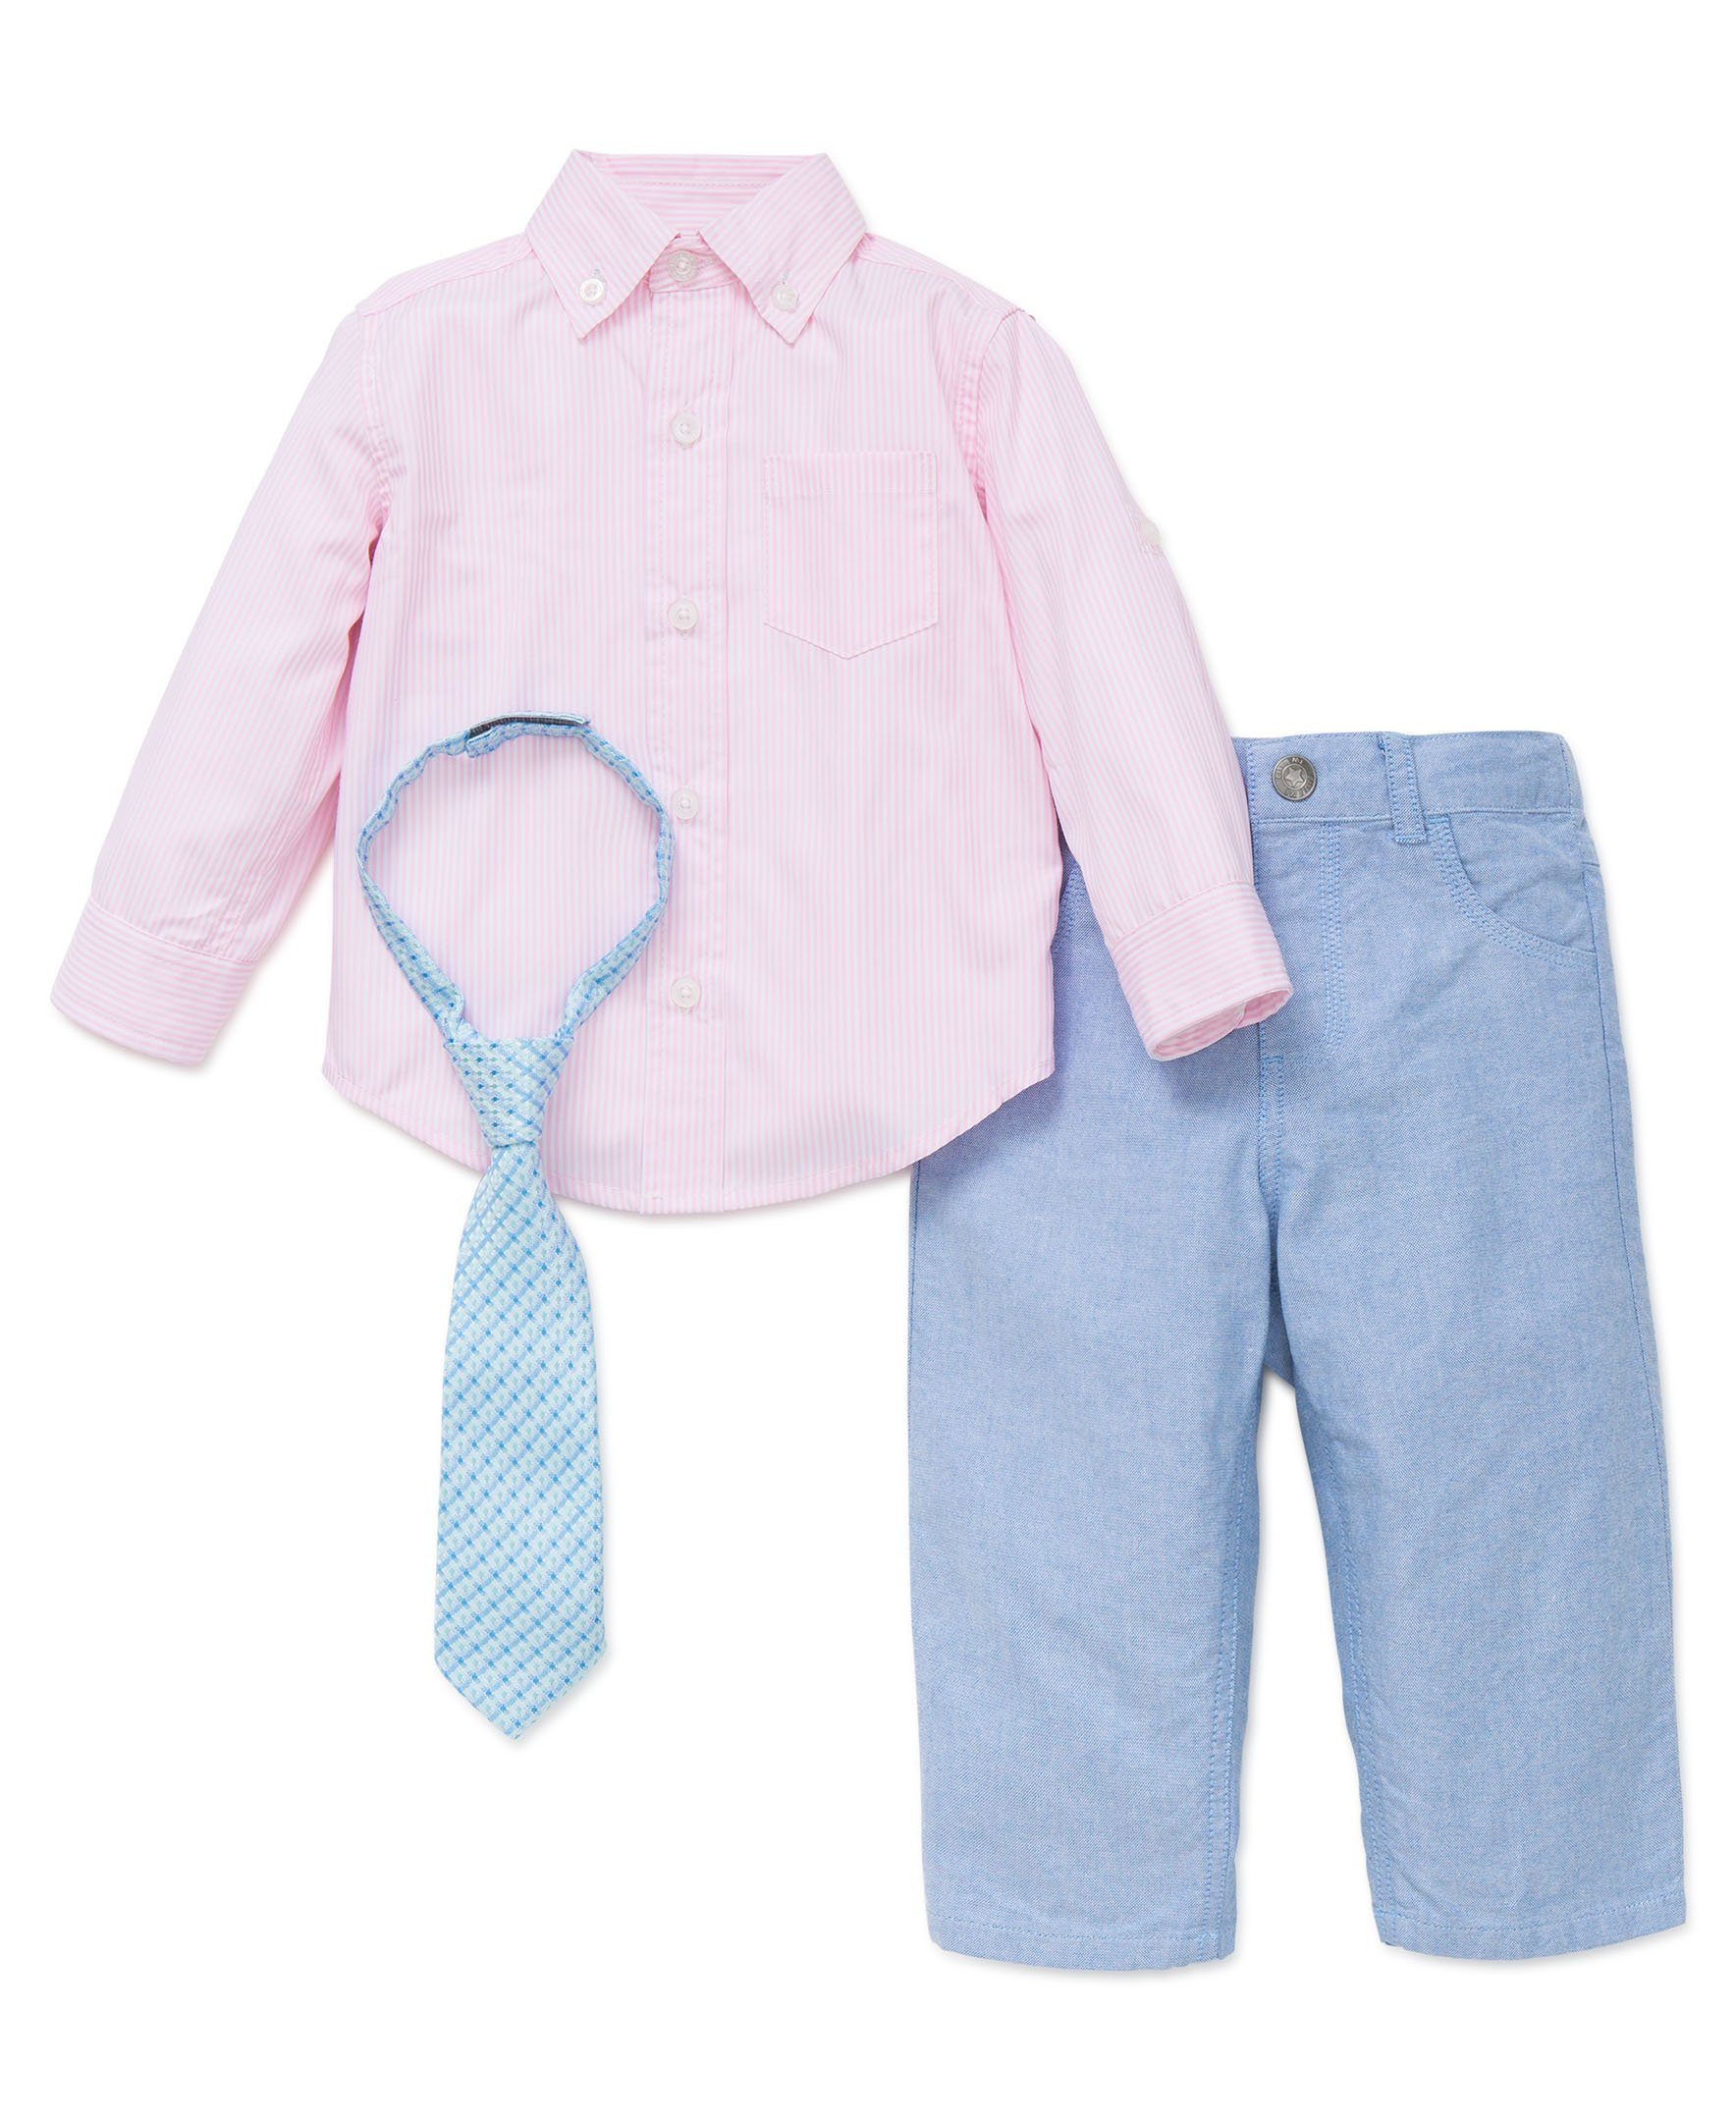 Little Me Baby Boys' Button Up Woven Pant Set